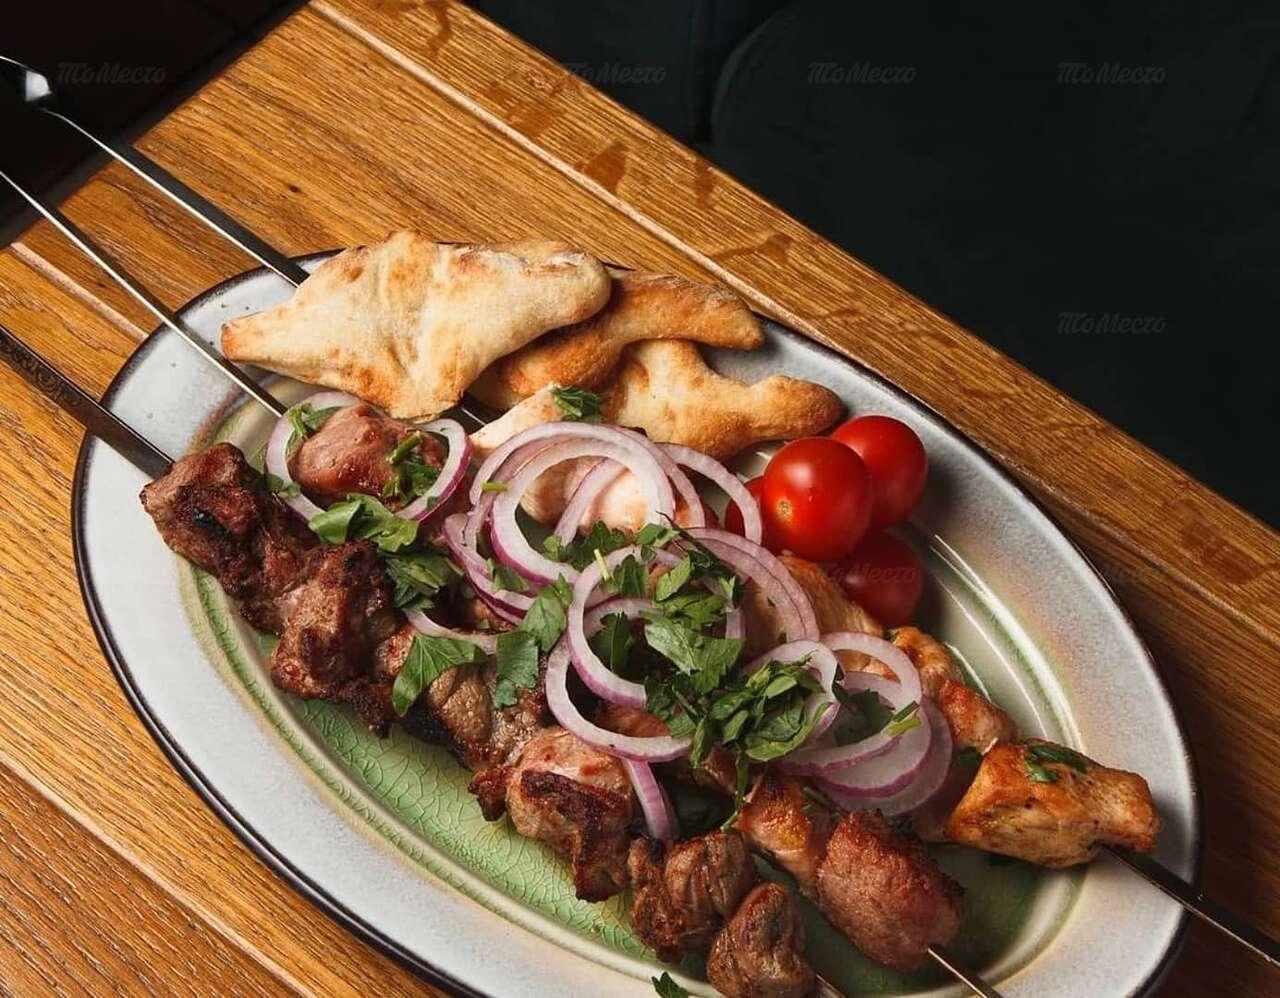 Меню ресторана Pshaveli (Пшавели) на набережной реки Карповки фото 14